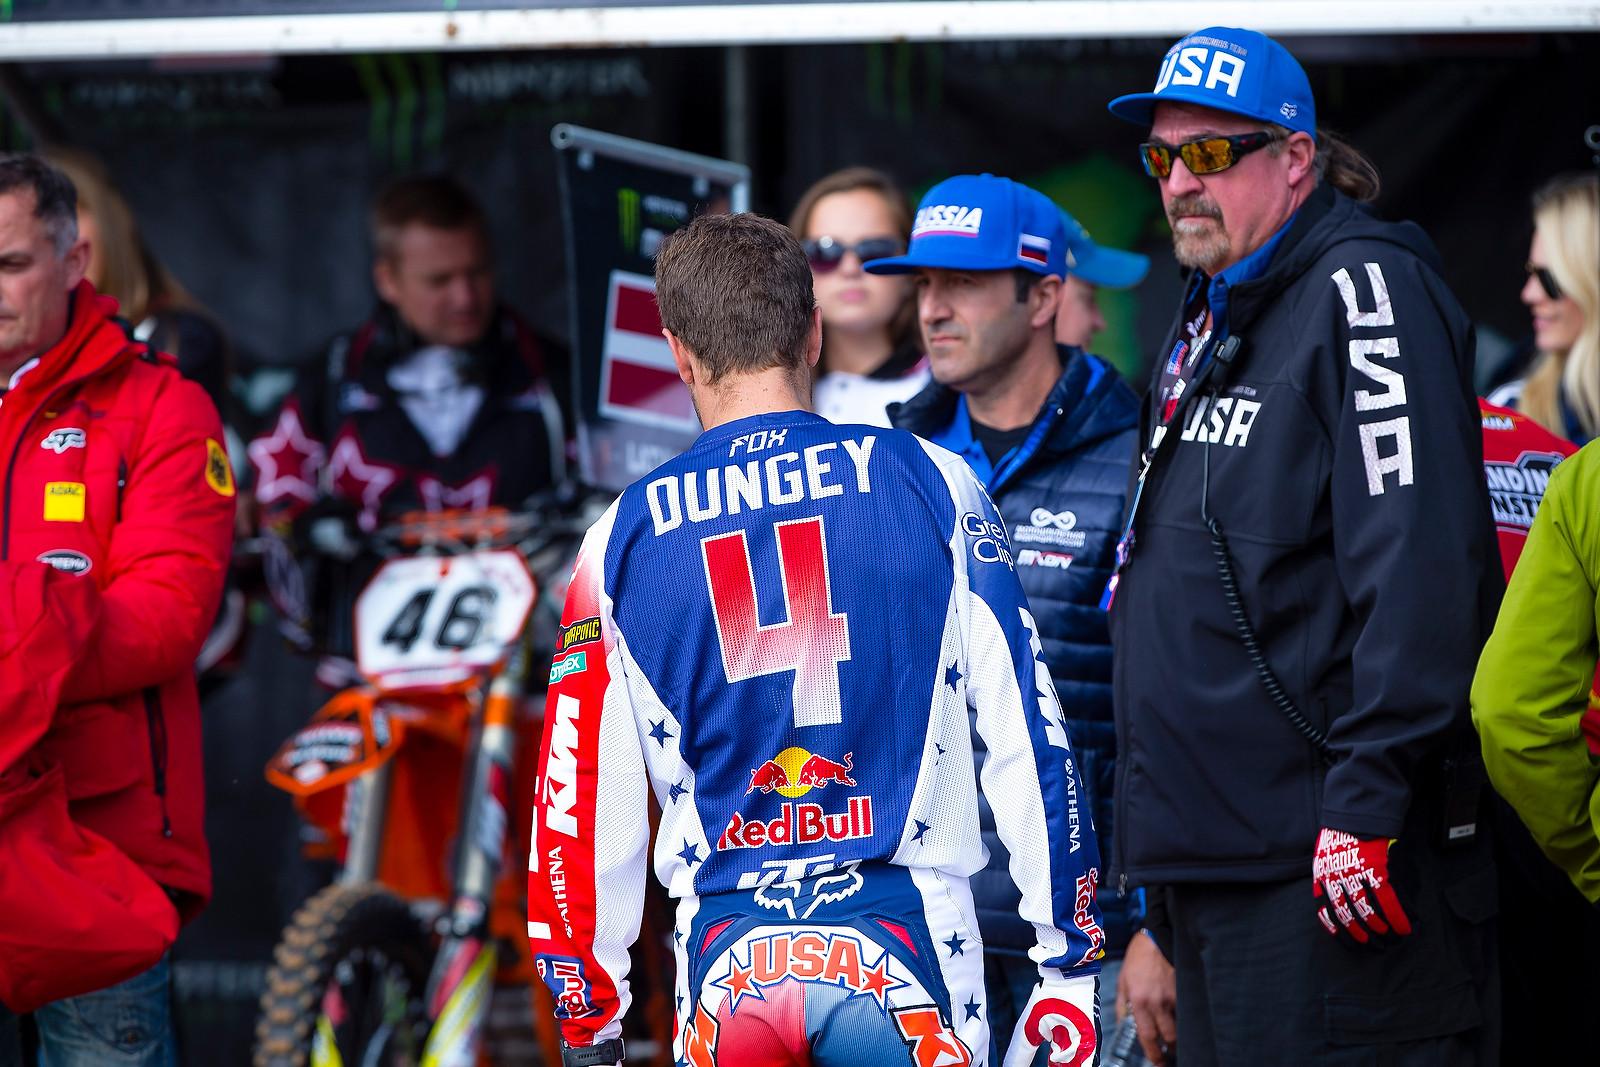 Big John - kardy - Motocross Pictures - Vital MX